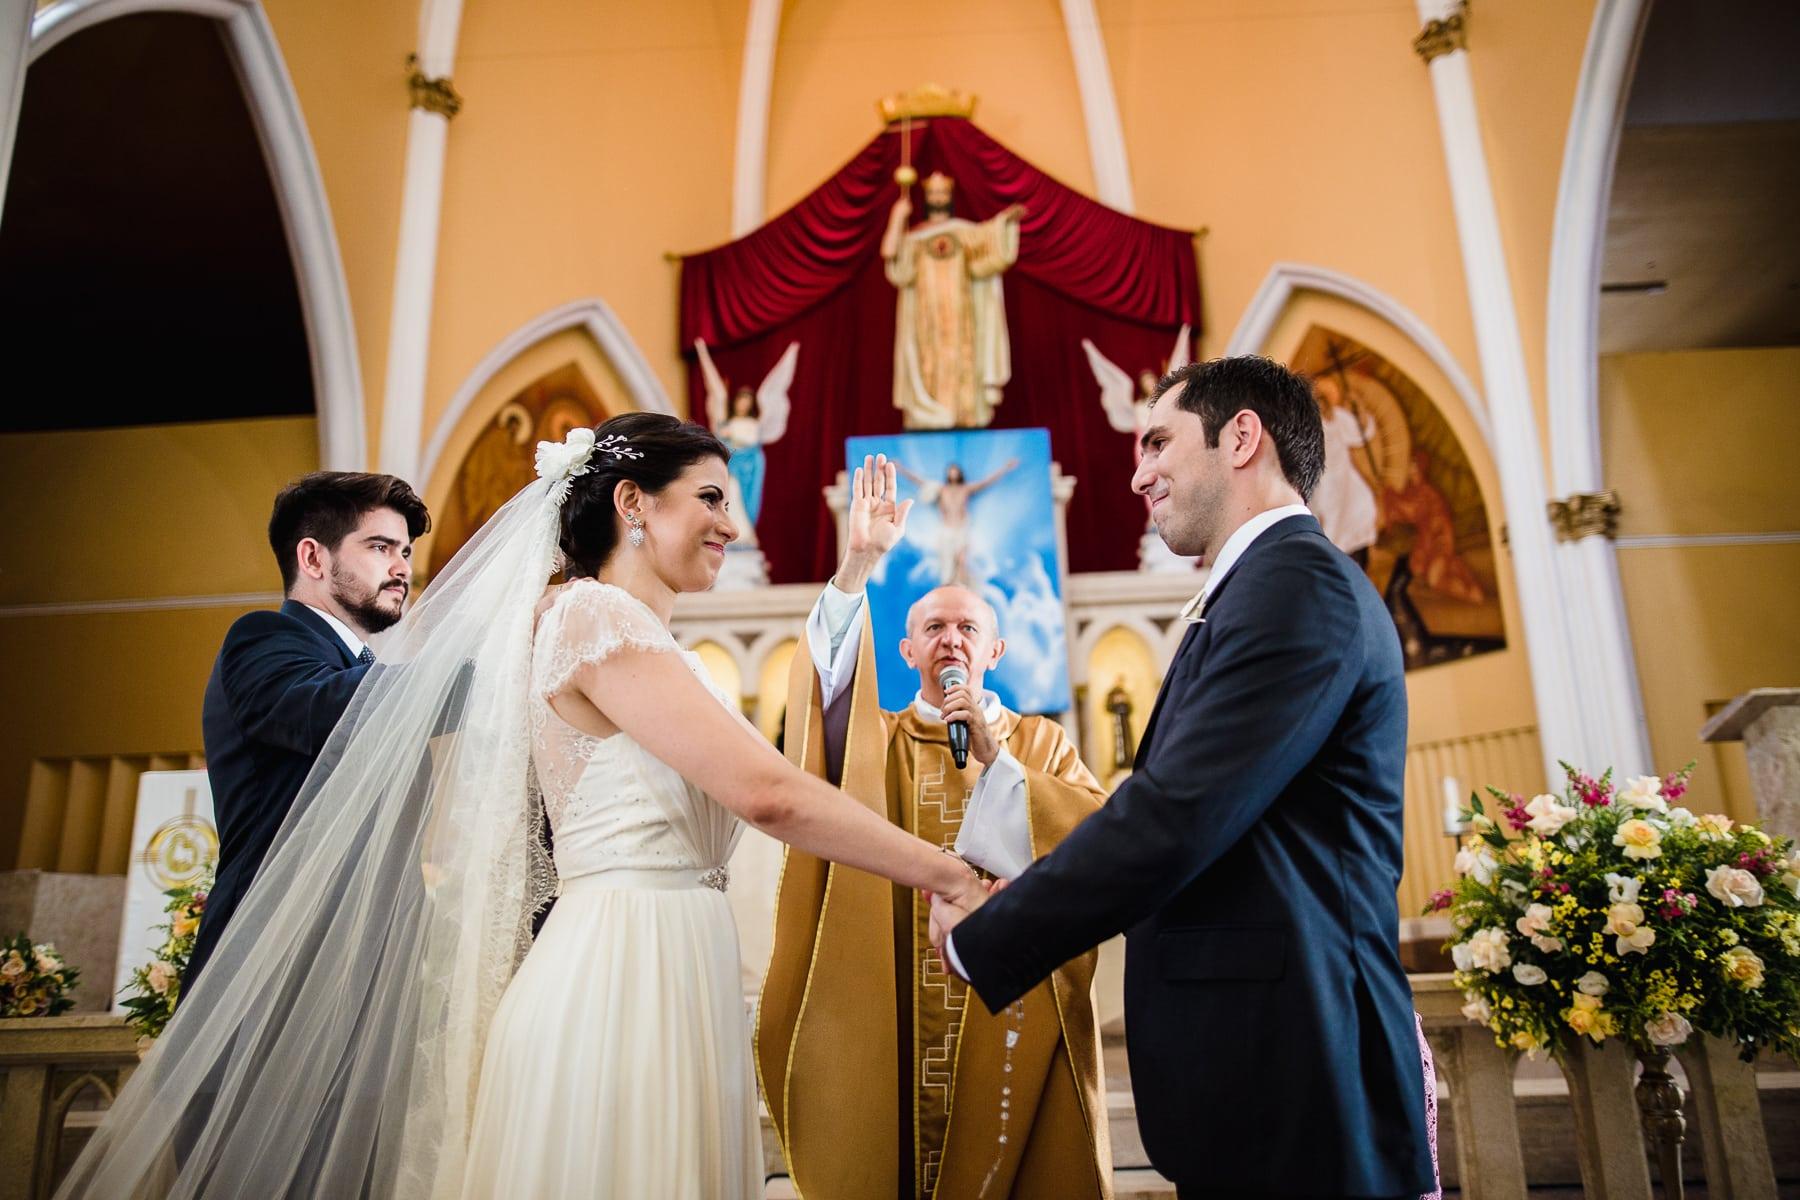 casamento-igreja-do-cristo-rei-fortaleza-42